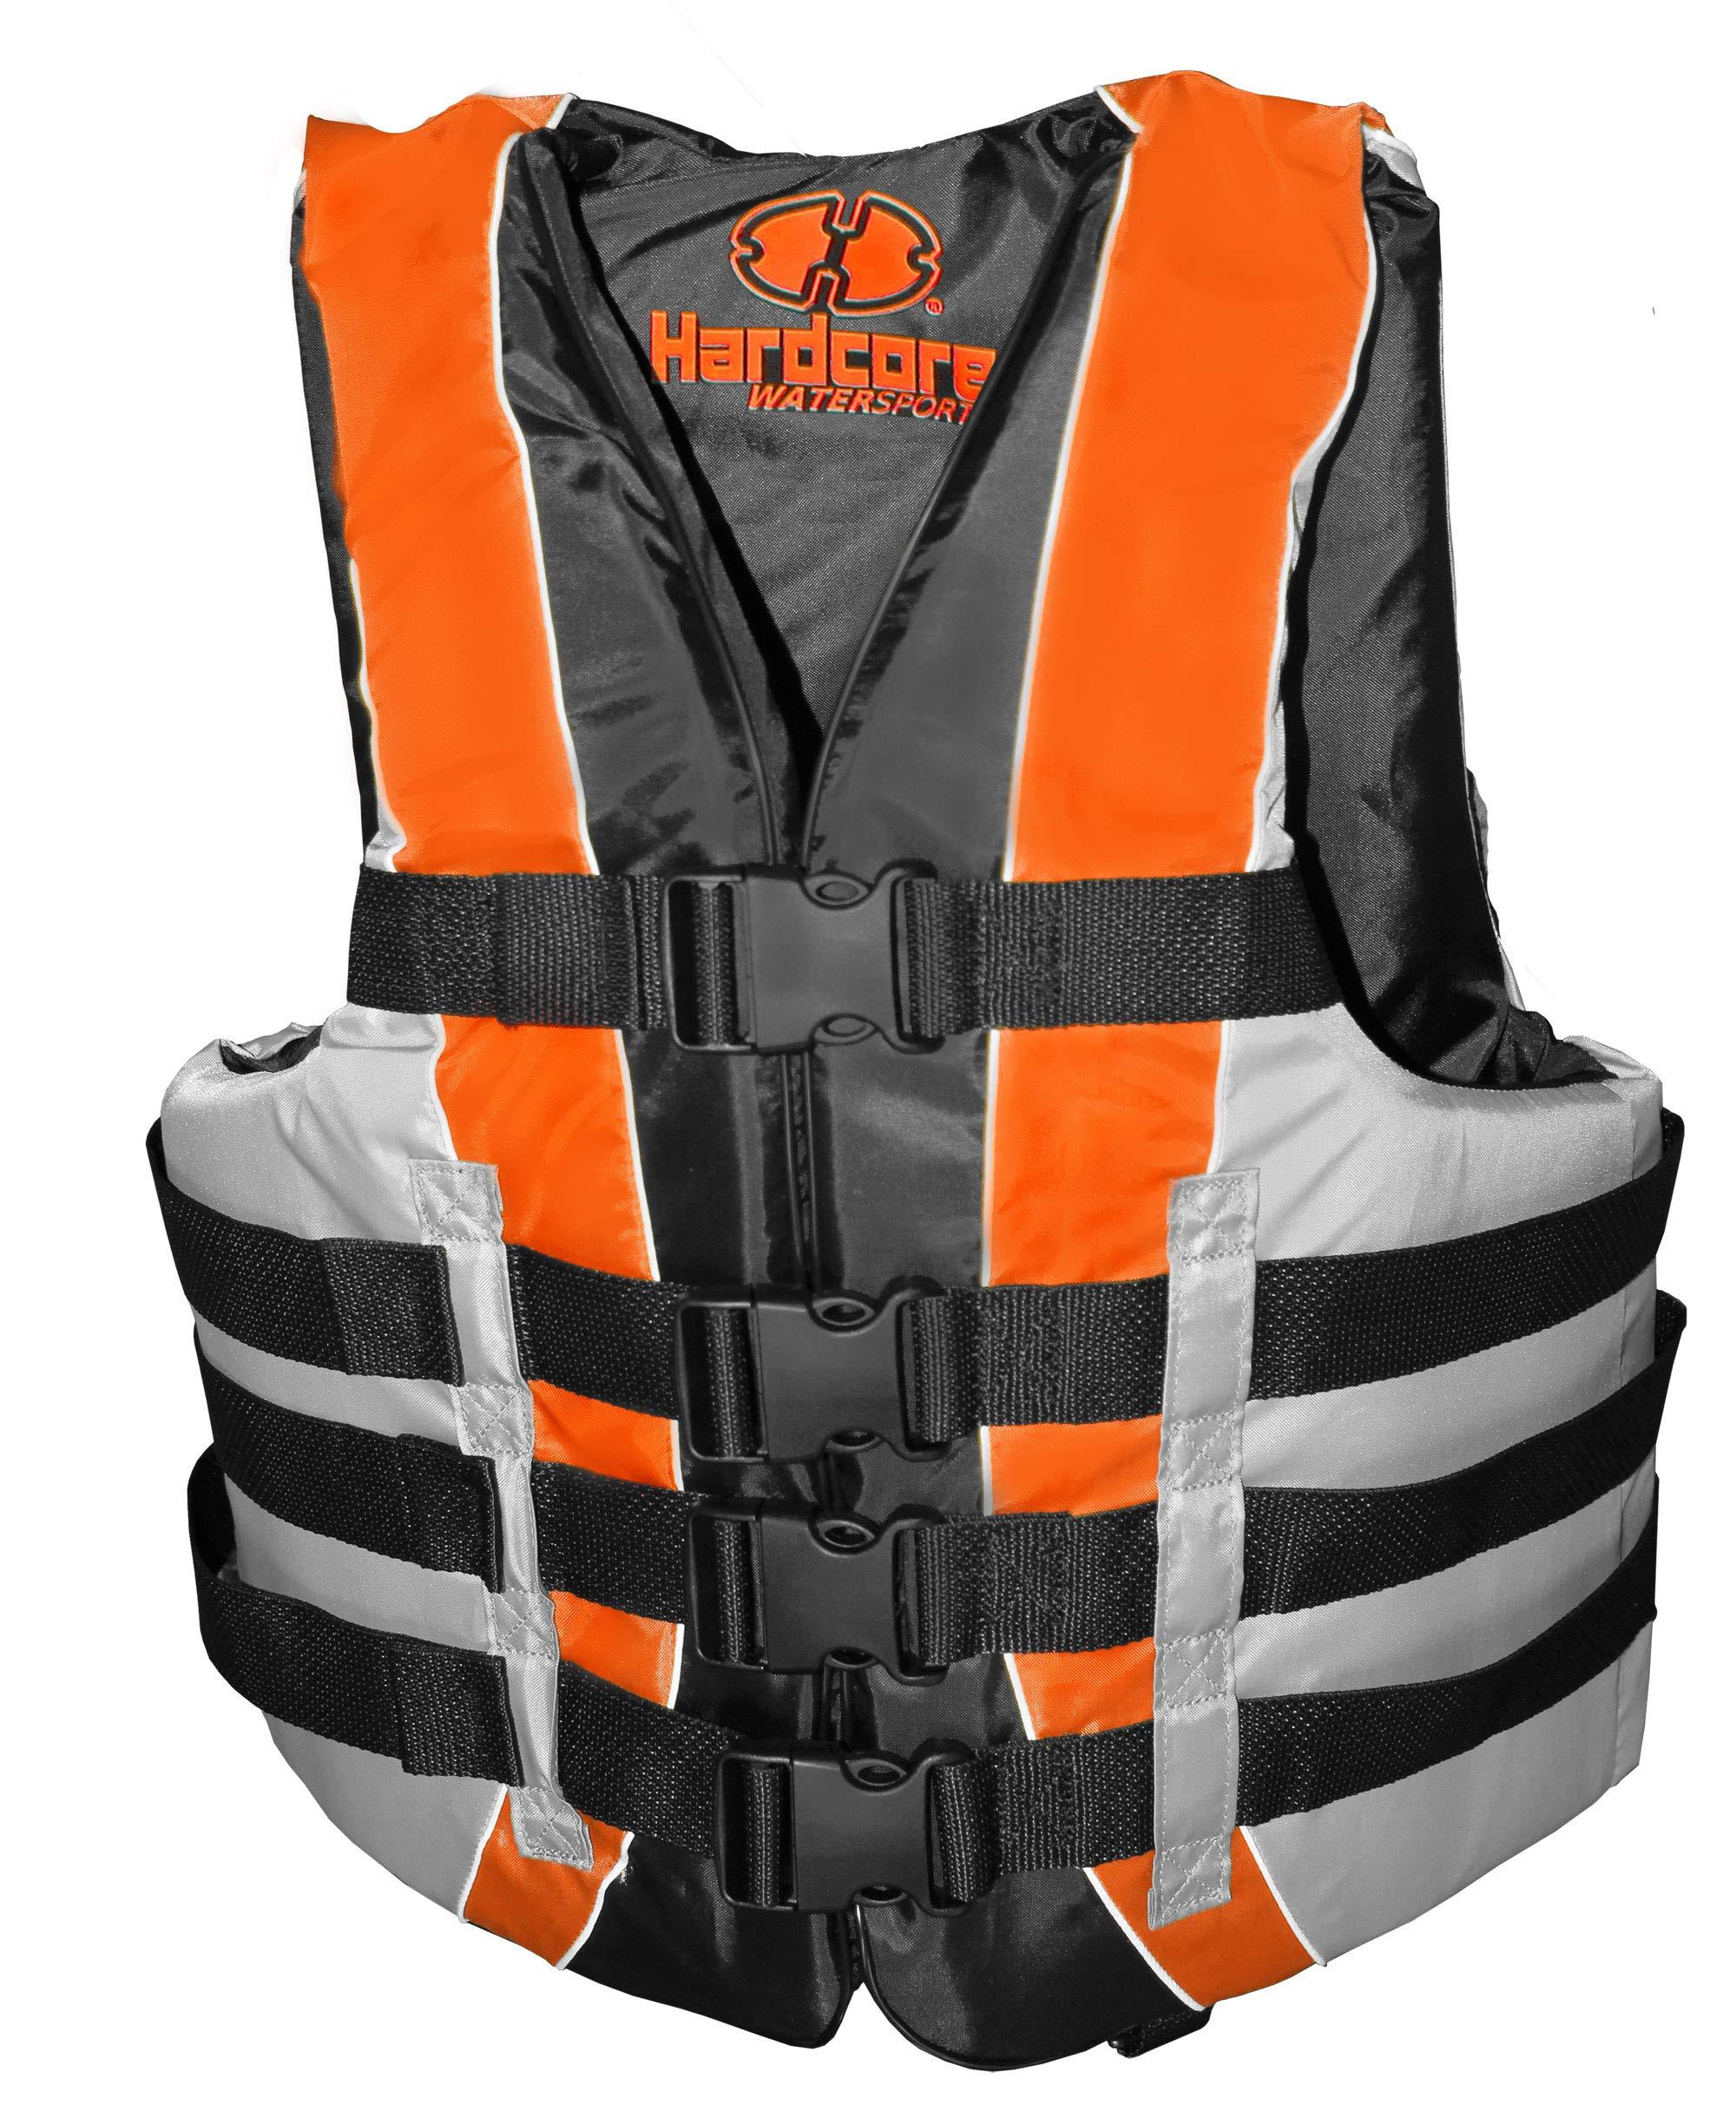 Hardcore Water Sports Adult L/XL Life Jacket Fully Enclosed Coast Guard PFD